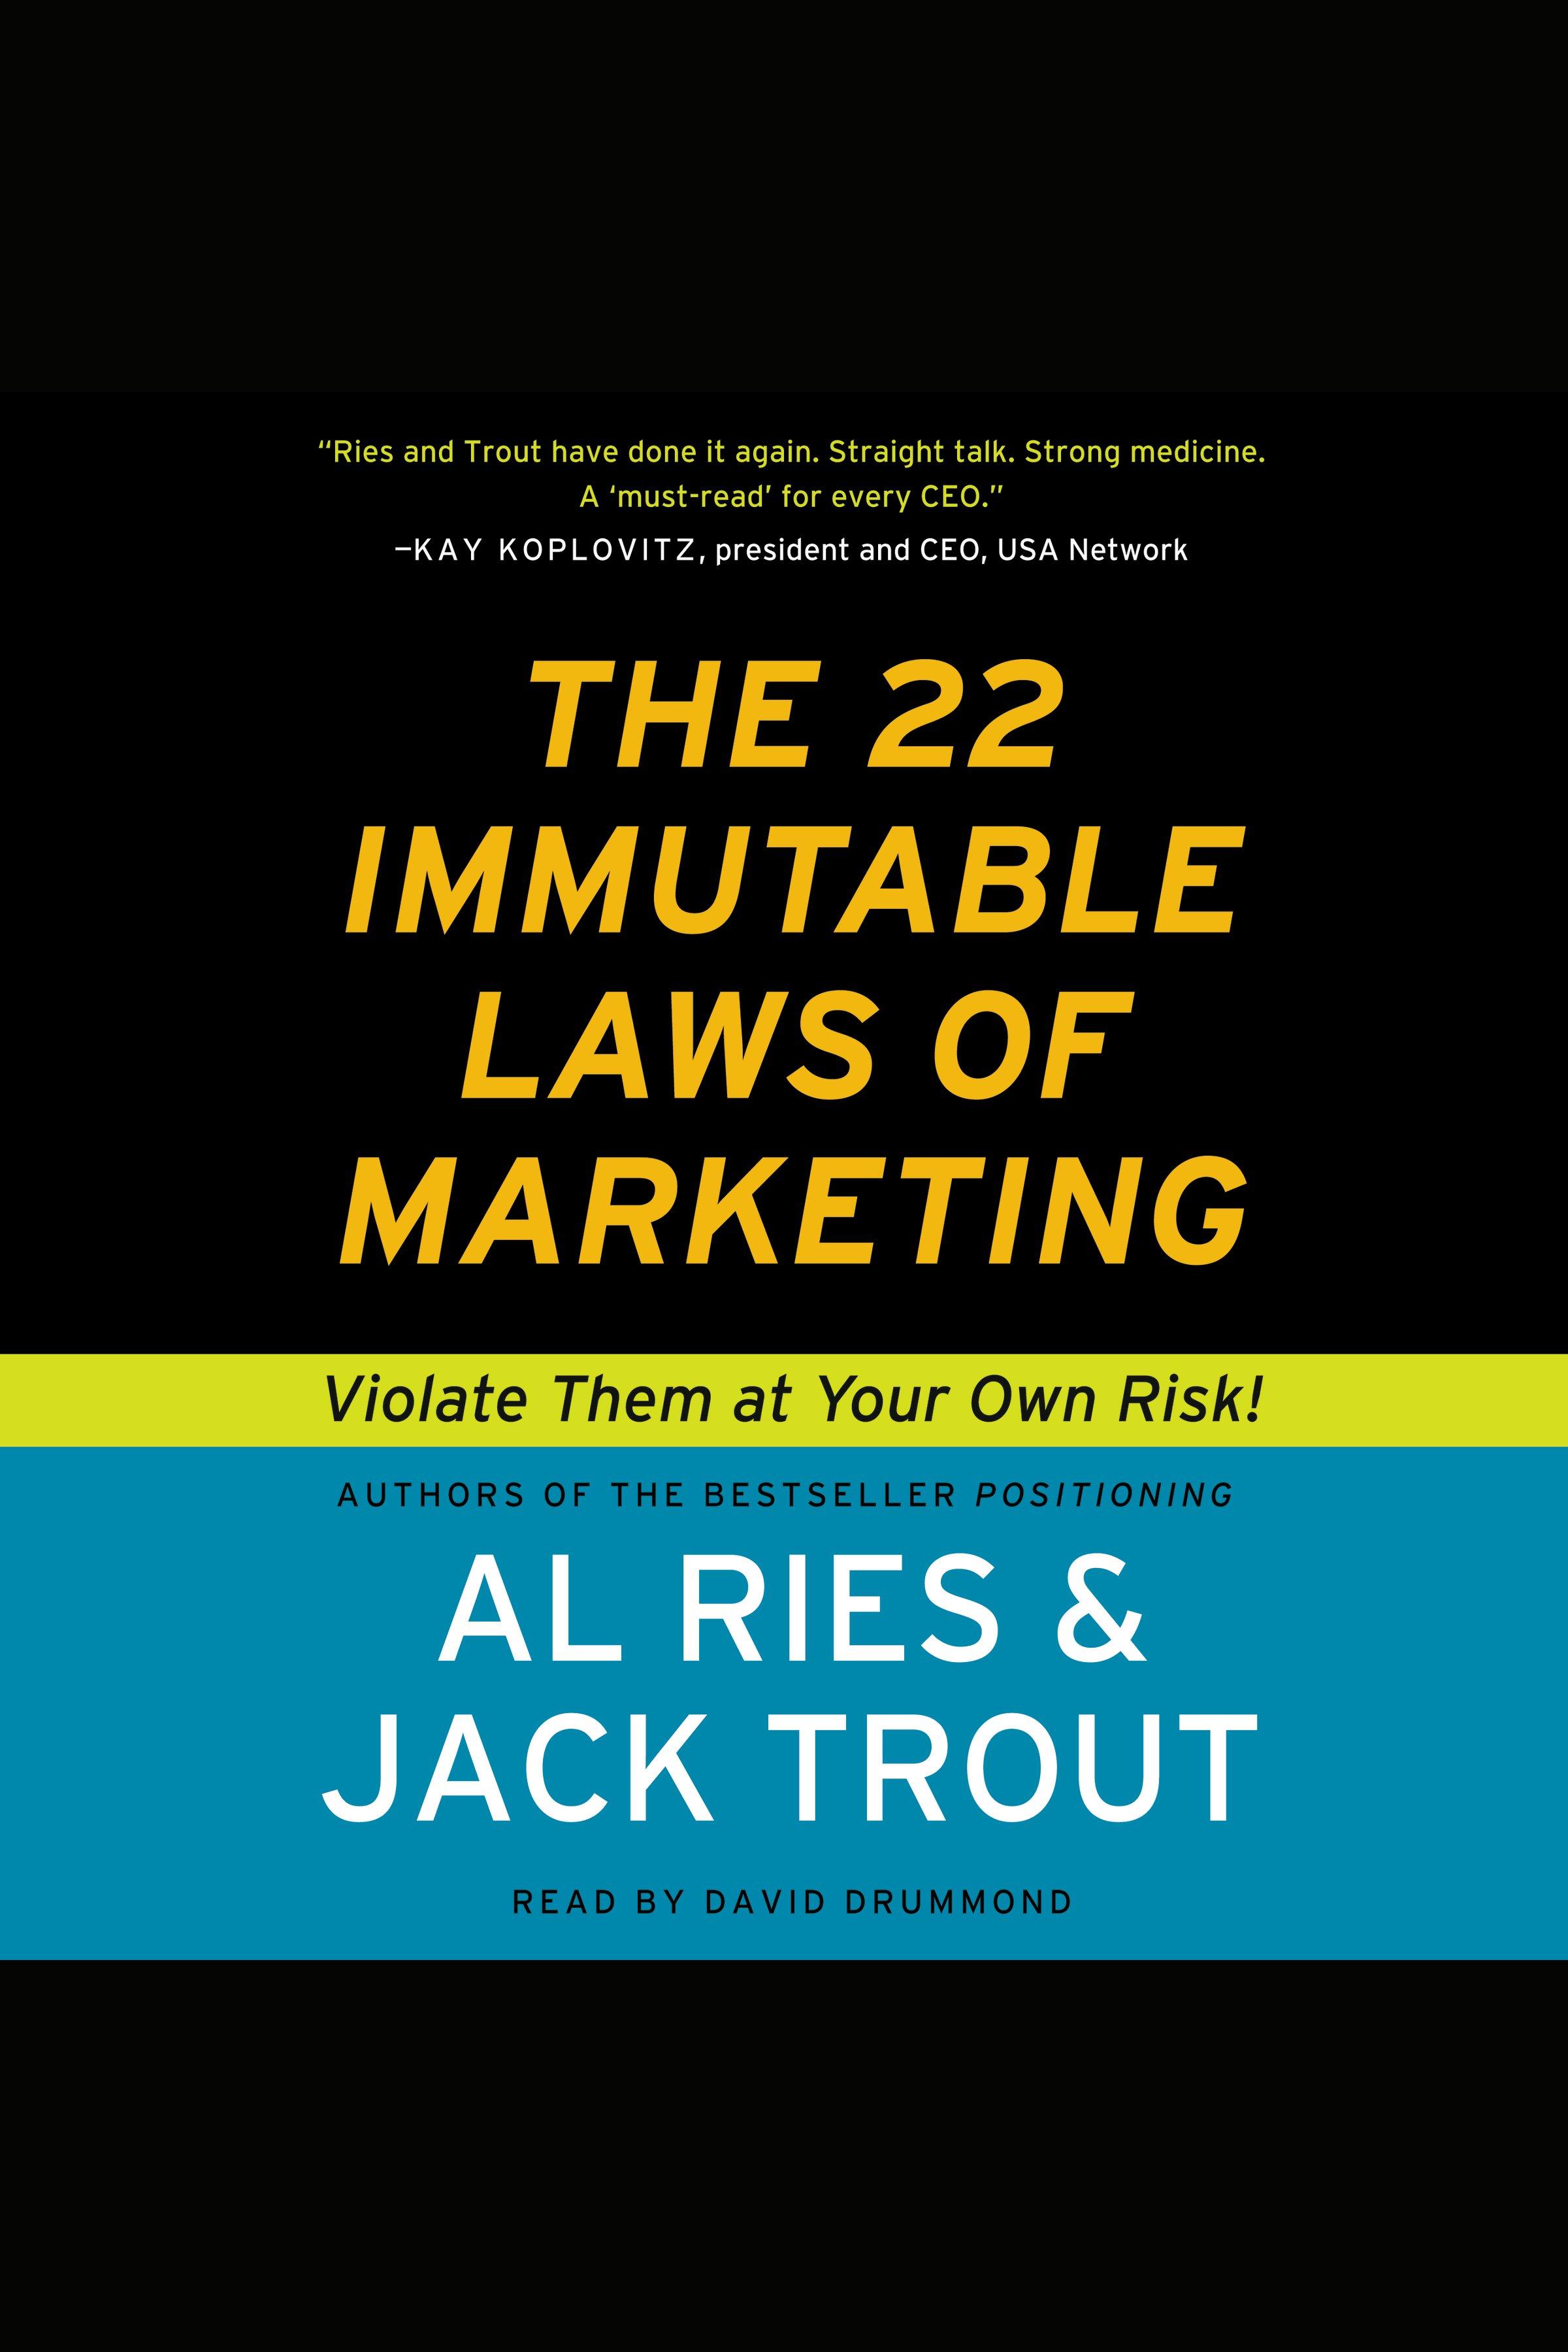 Esta es la portada del audiolibro 22 Immutable Laws of Marketing, The